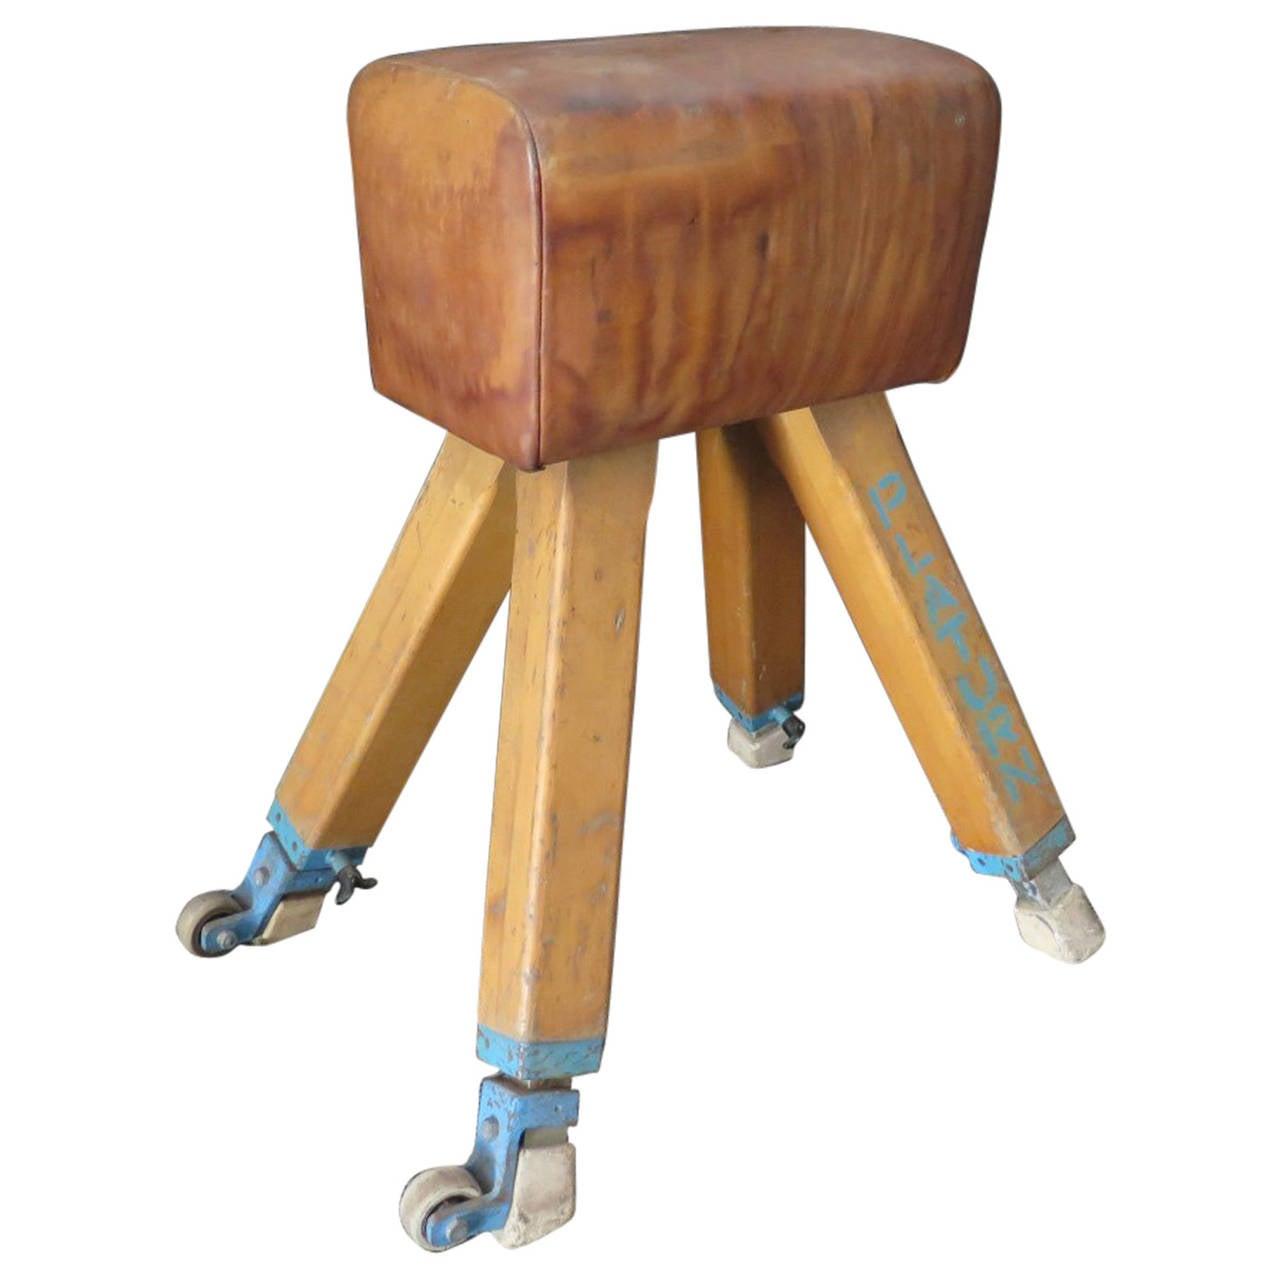 1960s Leather and Wood Italian Gymnastics Horse